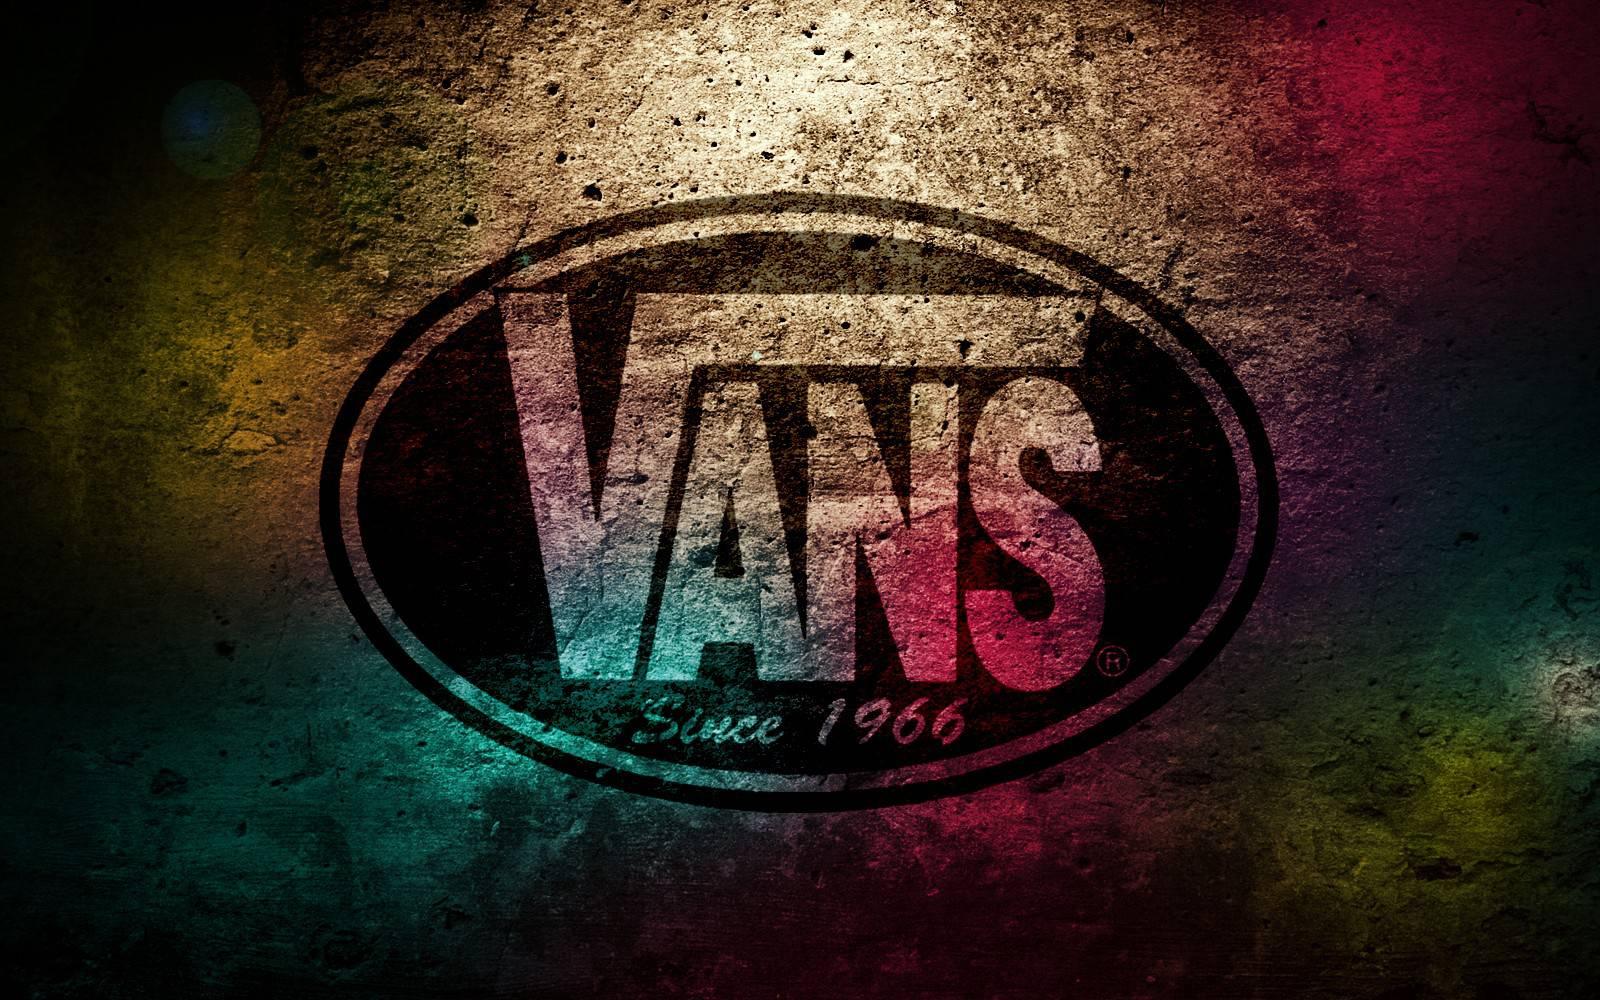 Cool Vans Logo Wallpapers Hd Hd Wallpapers Gallery